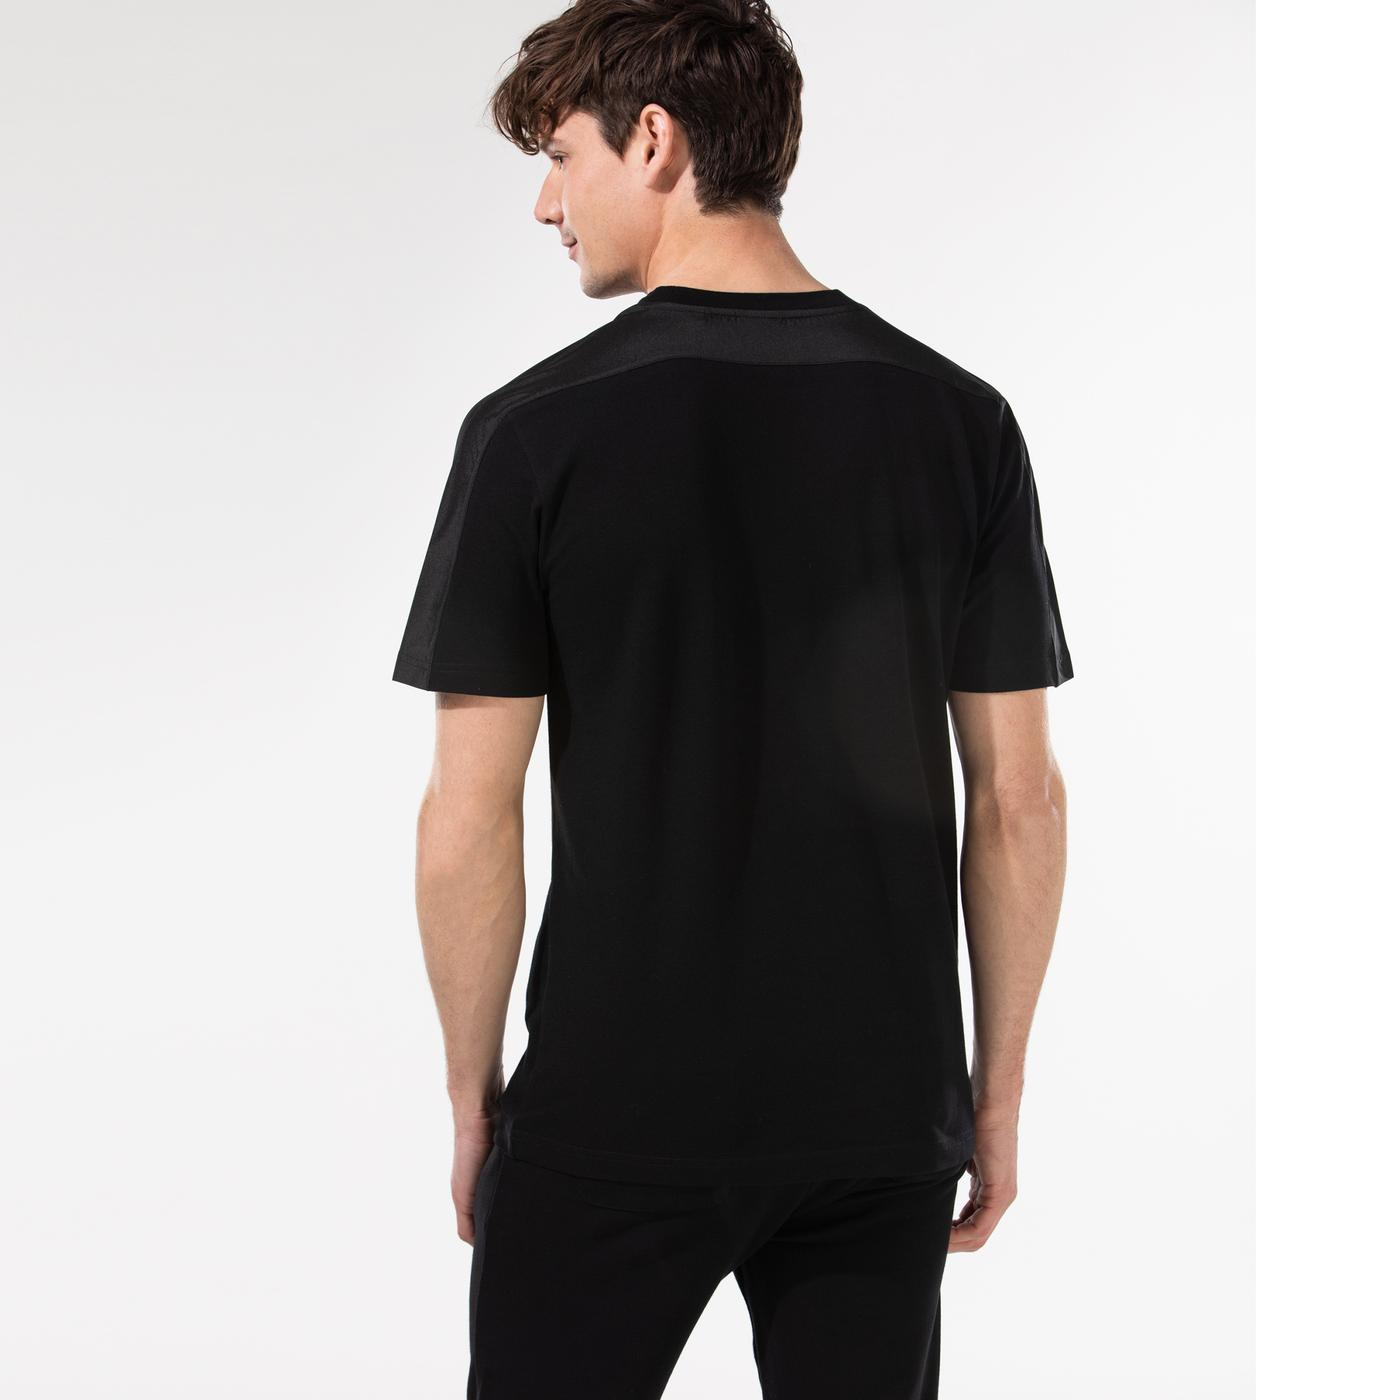 Skechers Graphic Erkek Siyah T-Shirt